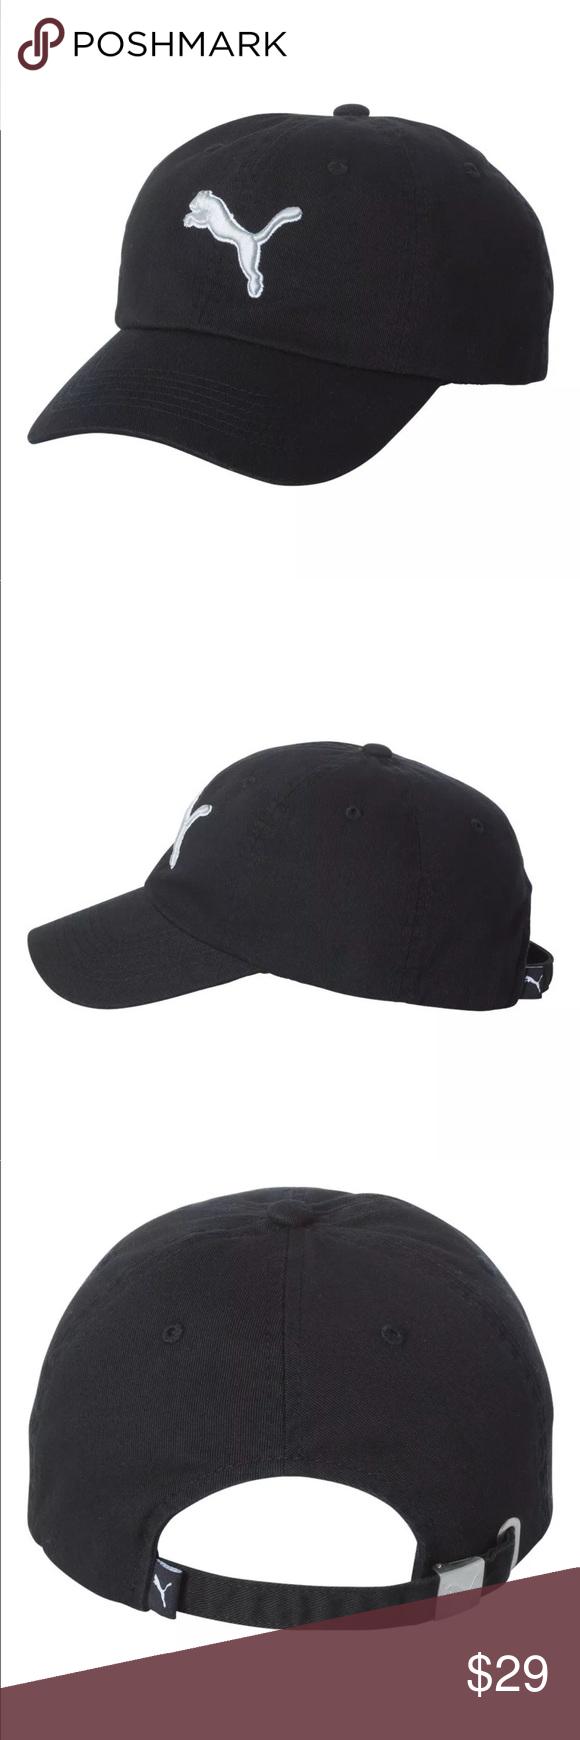 ca6d62c90cb PUMA Black Women s Cap NWOT Puma Black Women s Cap! NWOT Puma Accessories  Hats